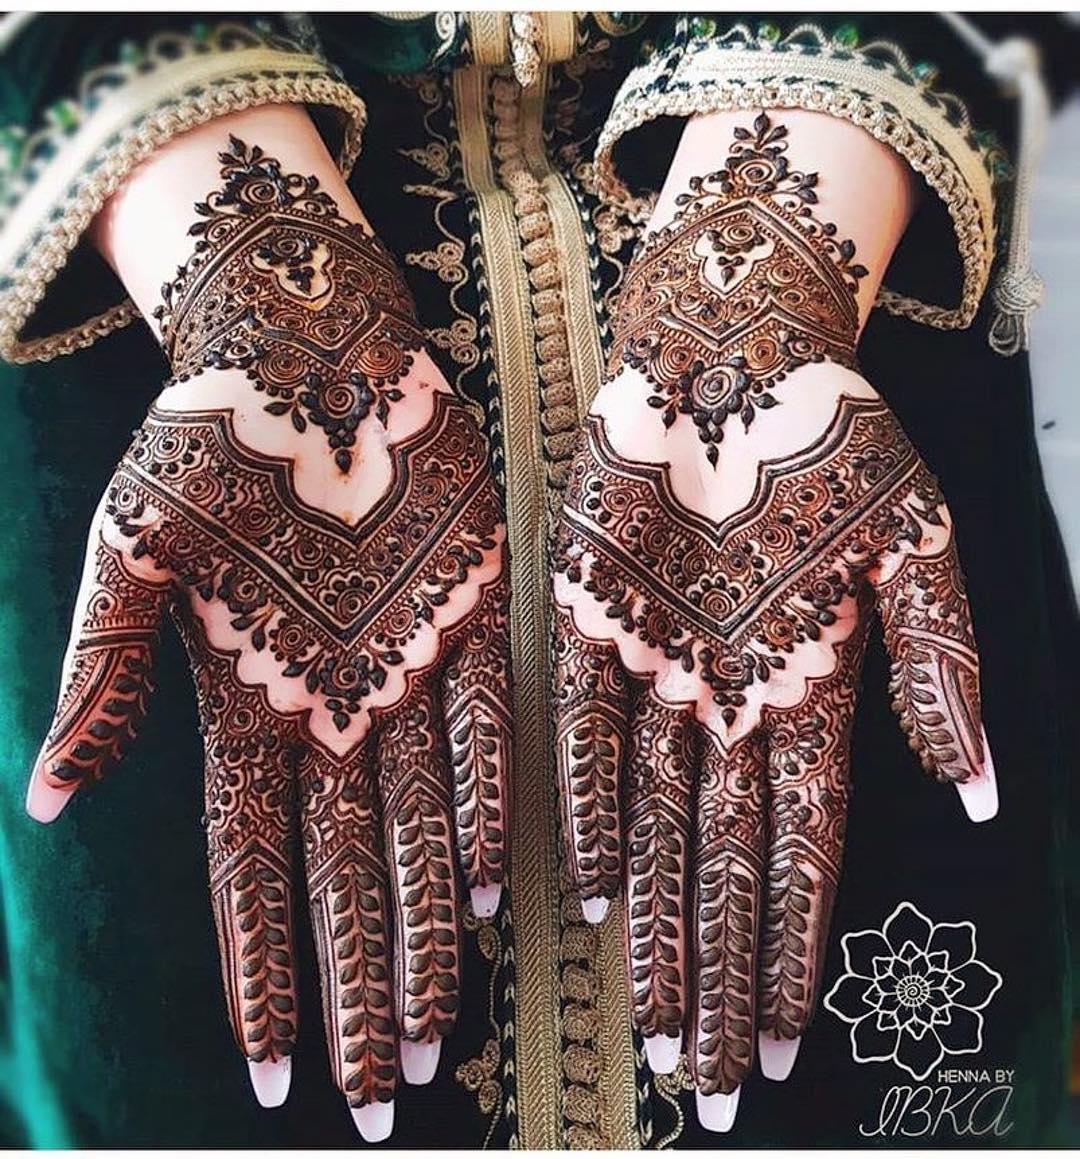 Best Mehndi Designs For Navratri 2018 Photos Inspirations, Mehndi For Durga Pooja, Mehndi For Garba, Mehndi For Pujo 2018 Mehendi Designs